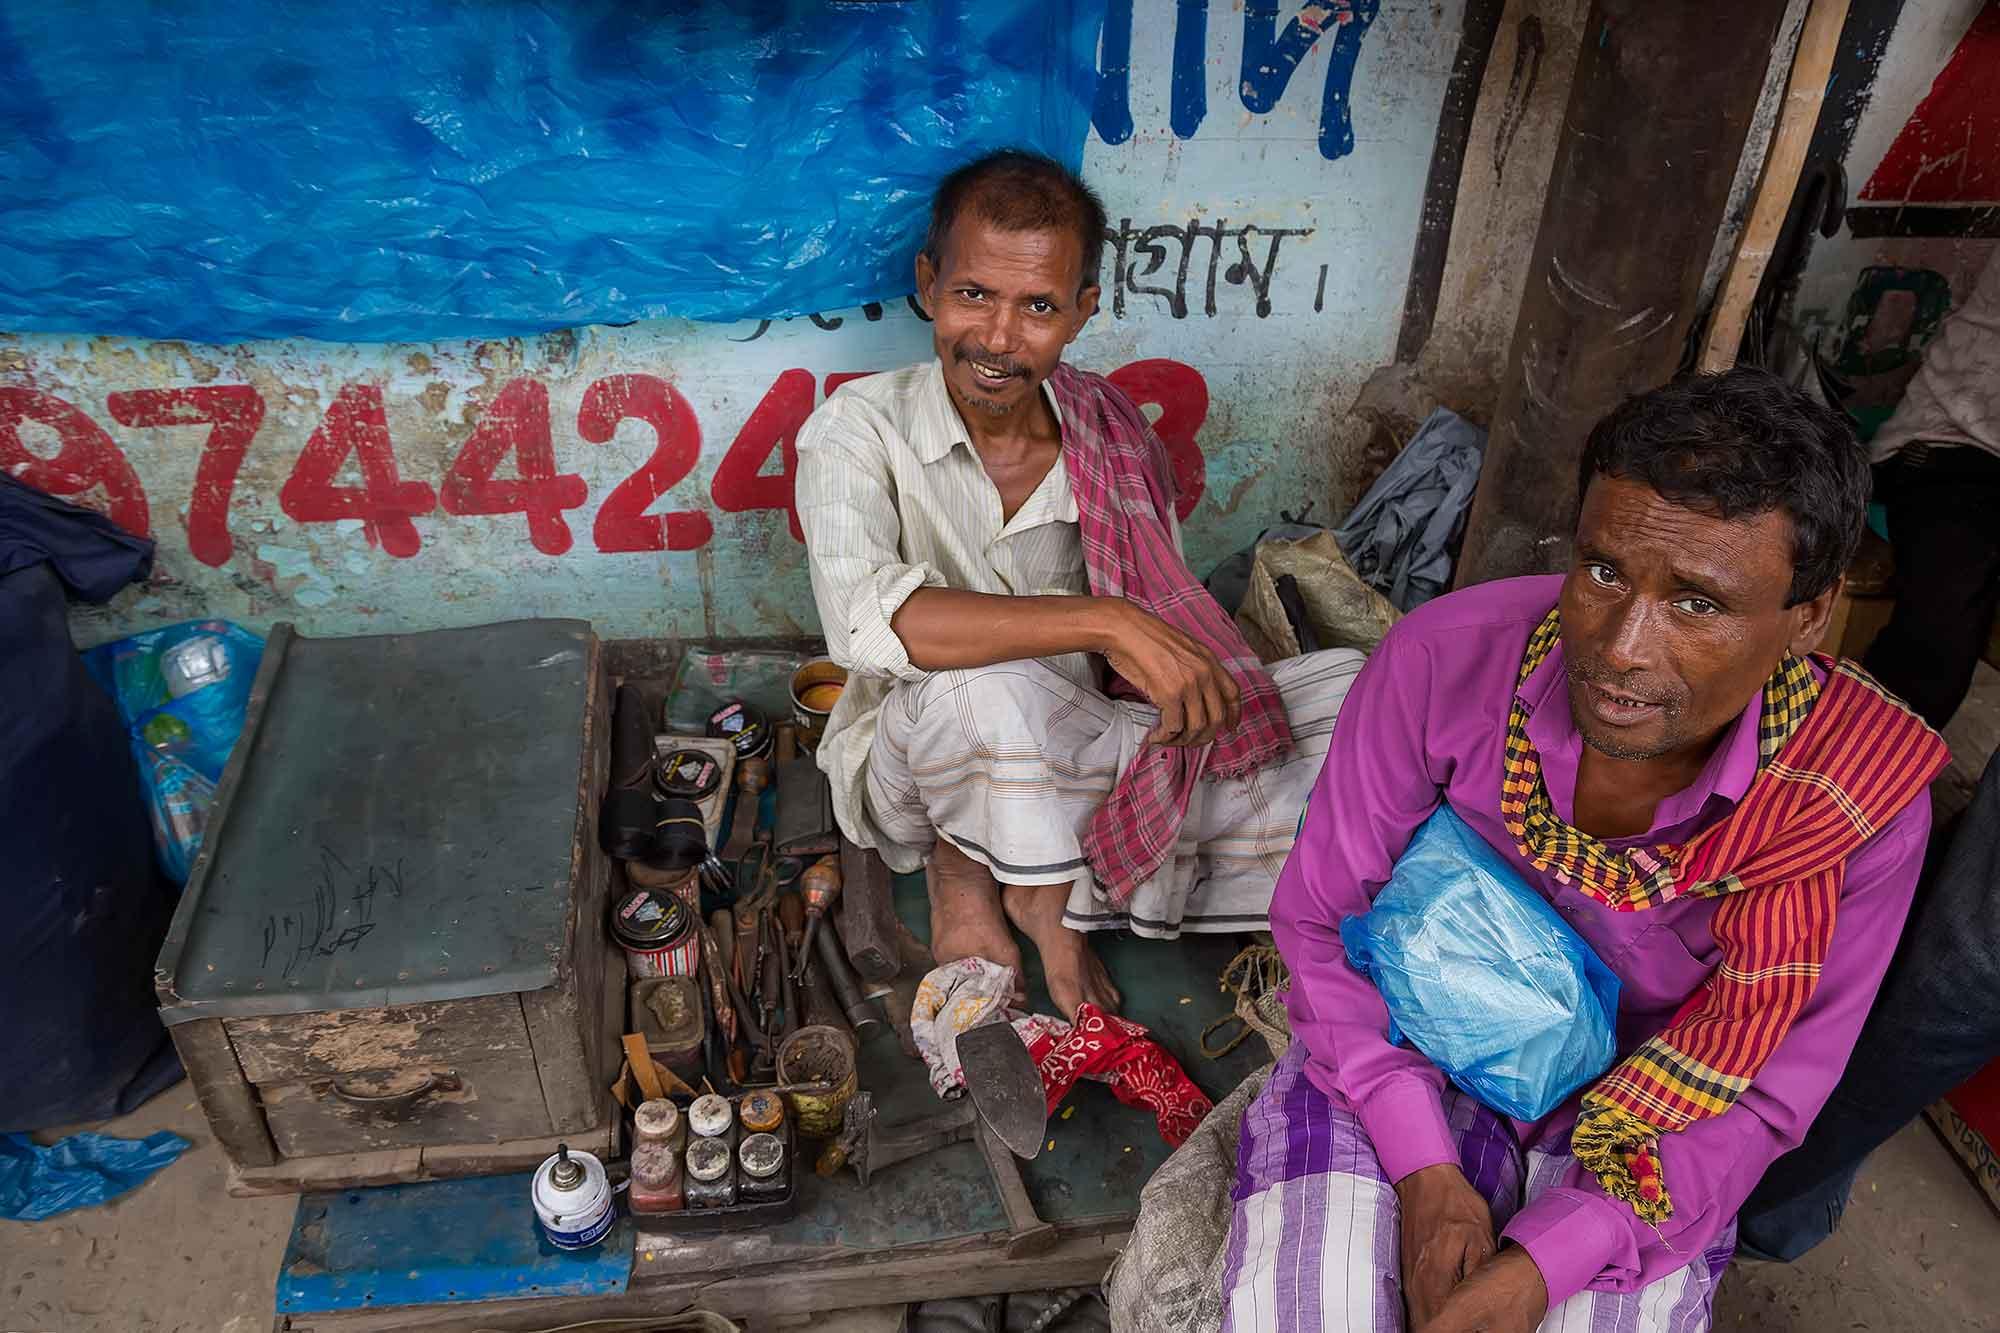 Street life in Dhaka, Bangladesh. © Ulli Maier & Nisa Maier